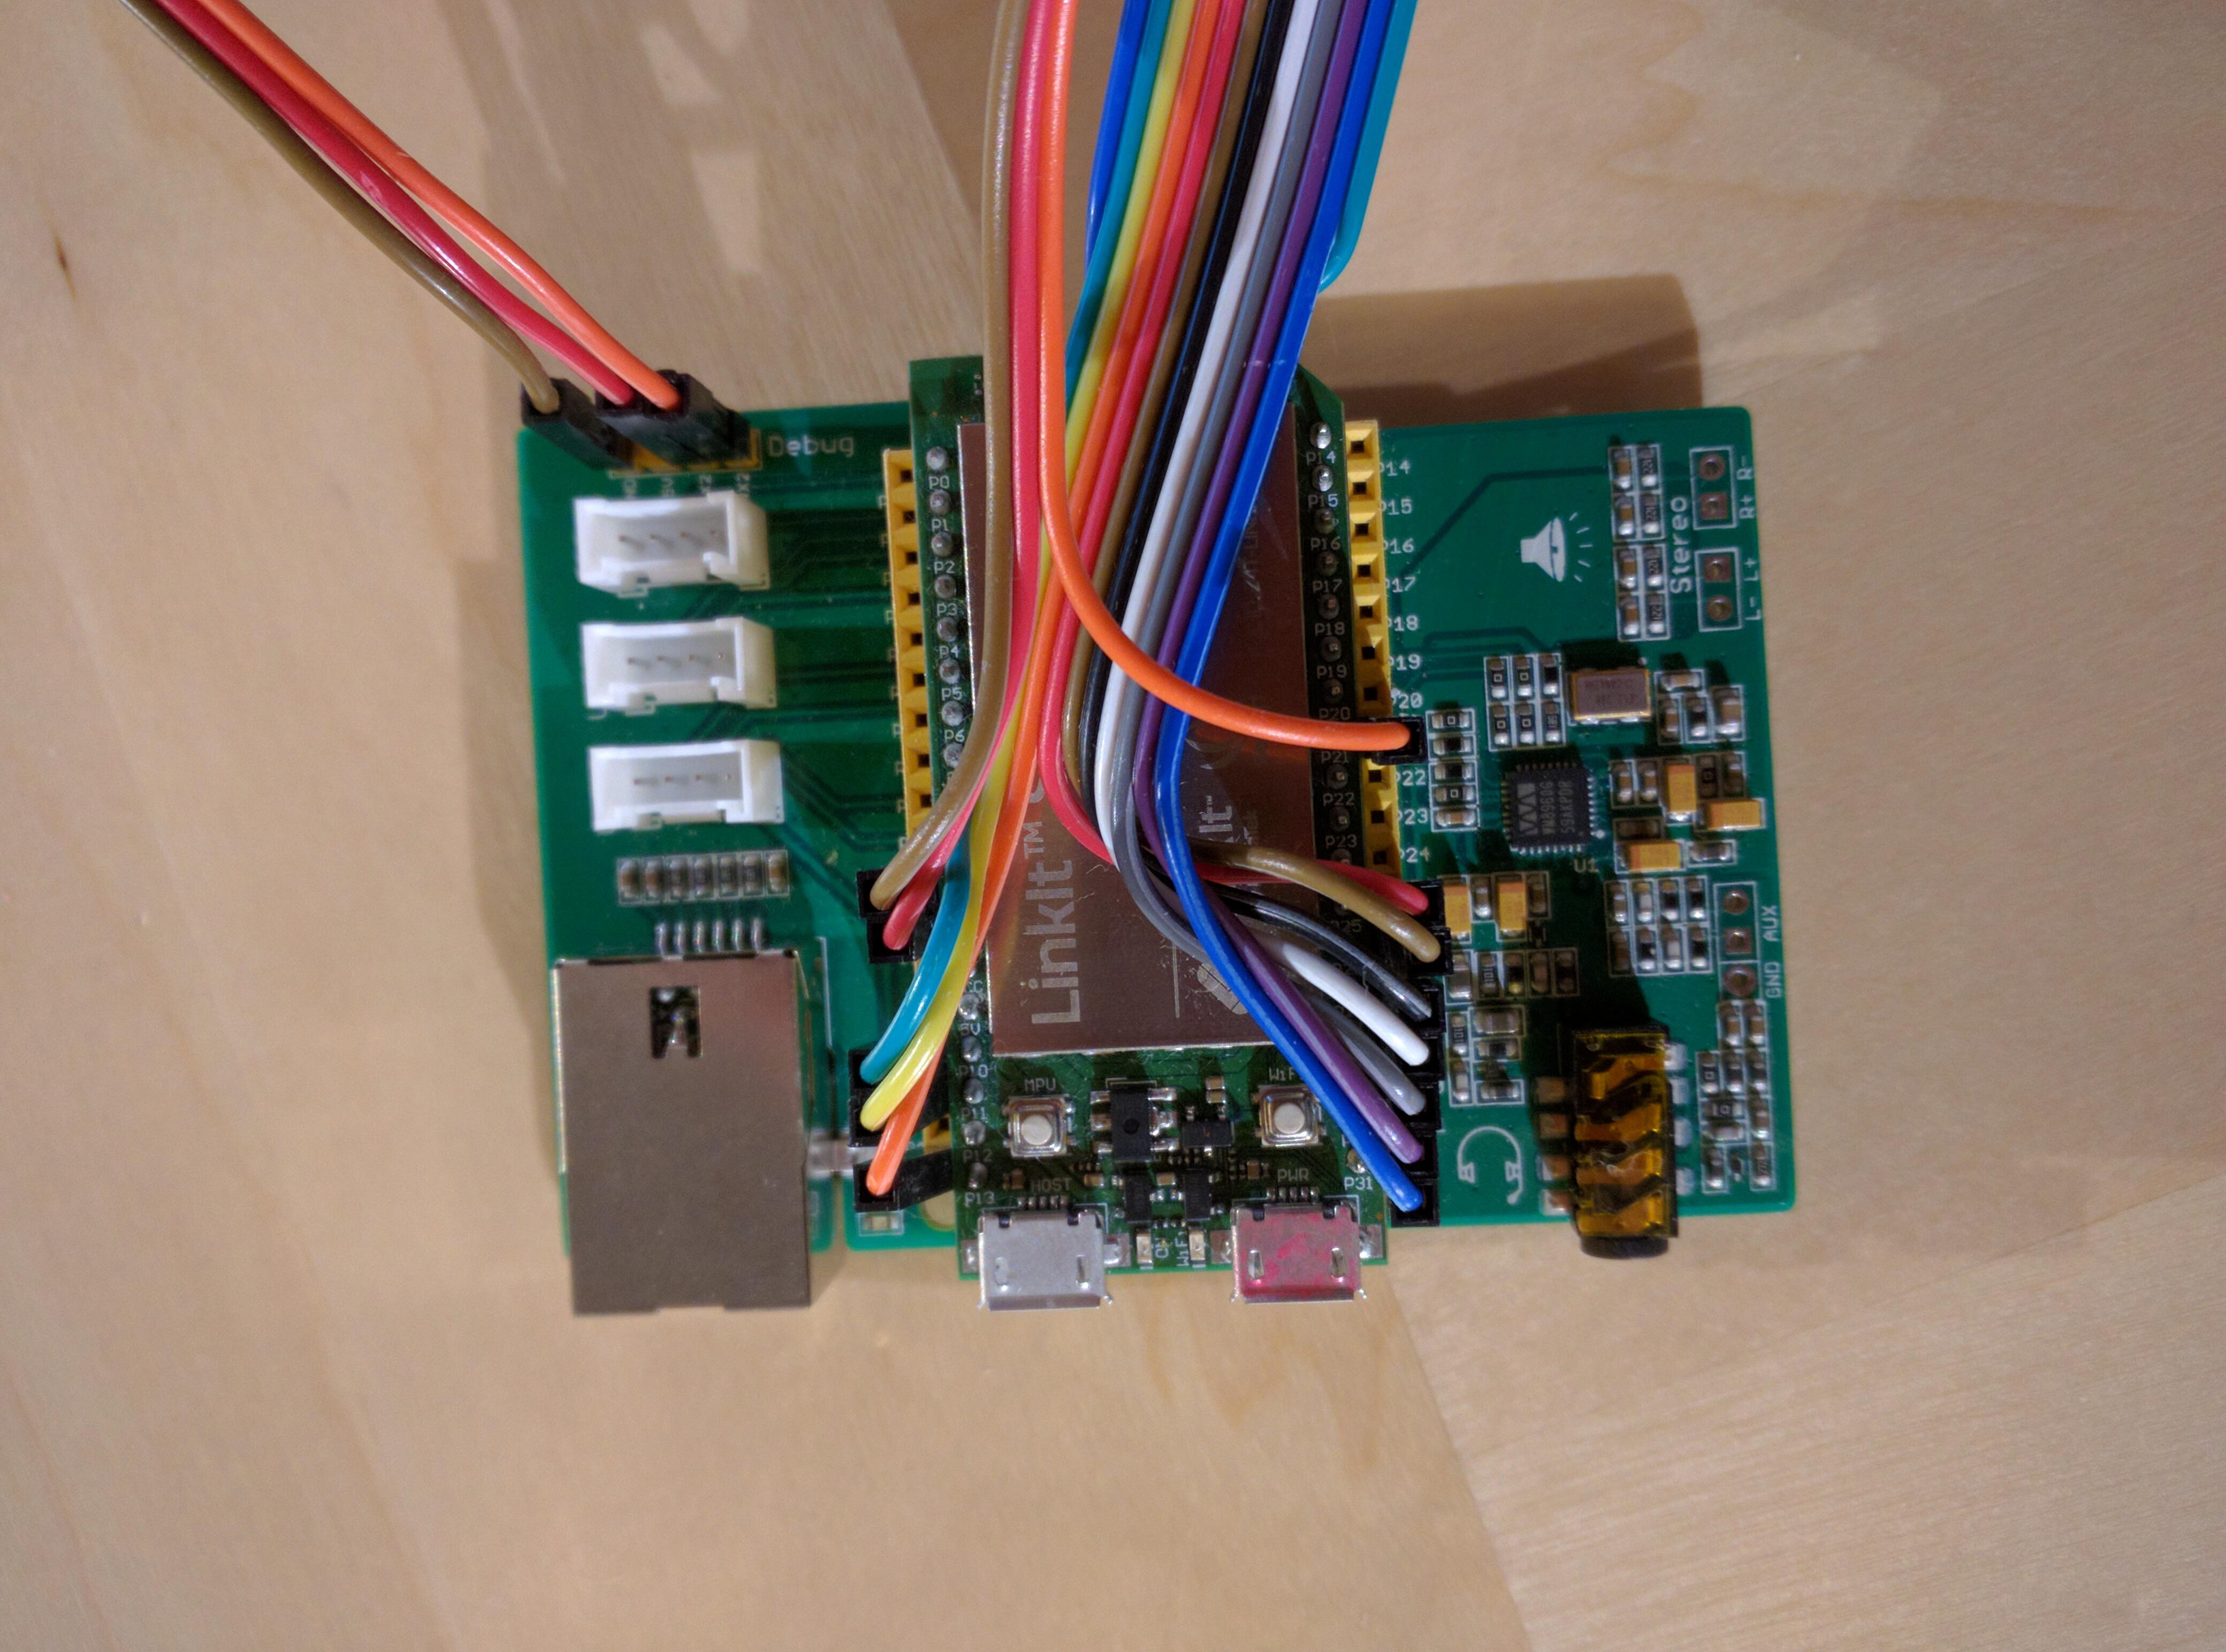 Usb wiring diagram wikipedia wiring diagram on usb wiring diagram wikipedia USB Motherboard Diagram usb type b